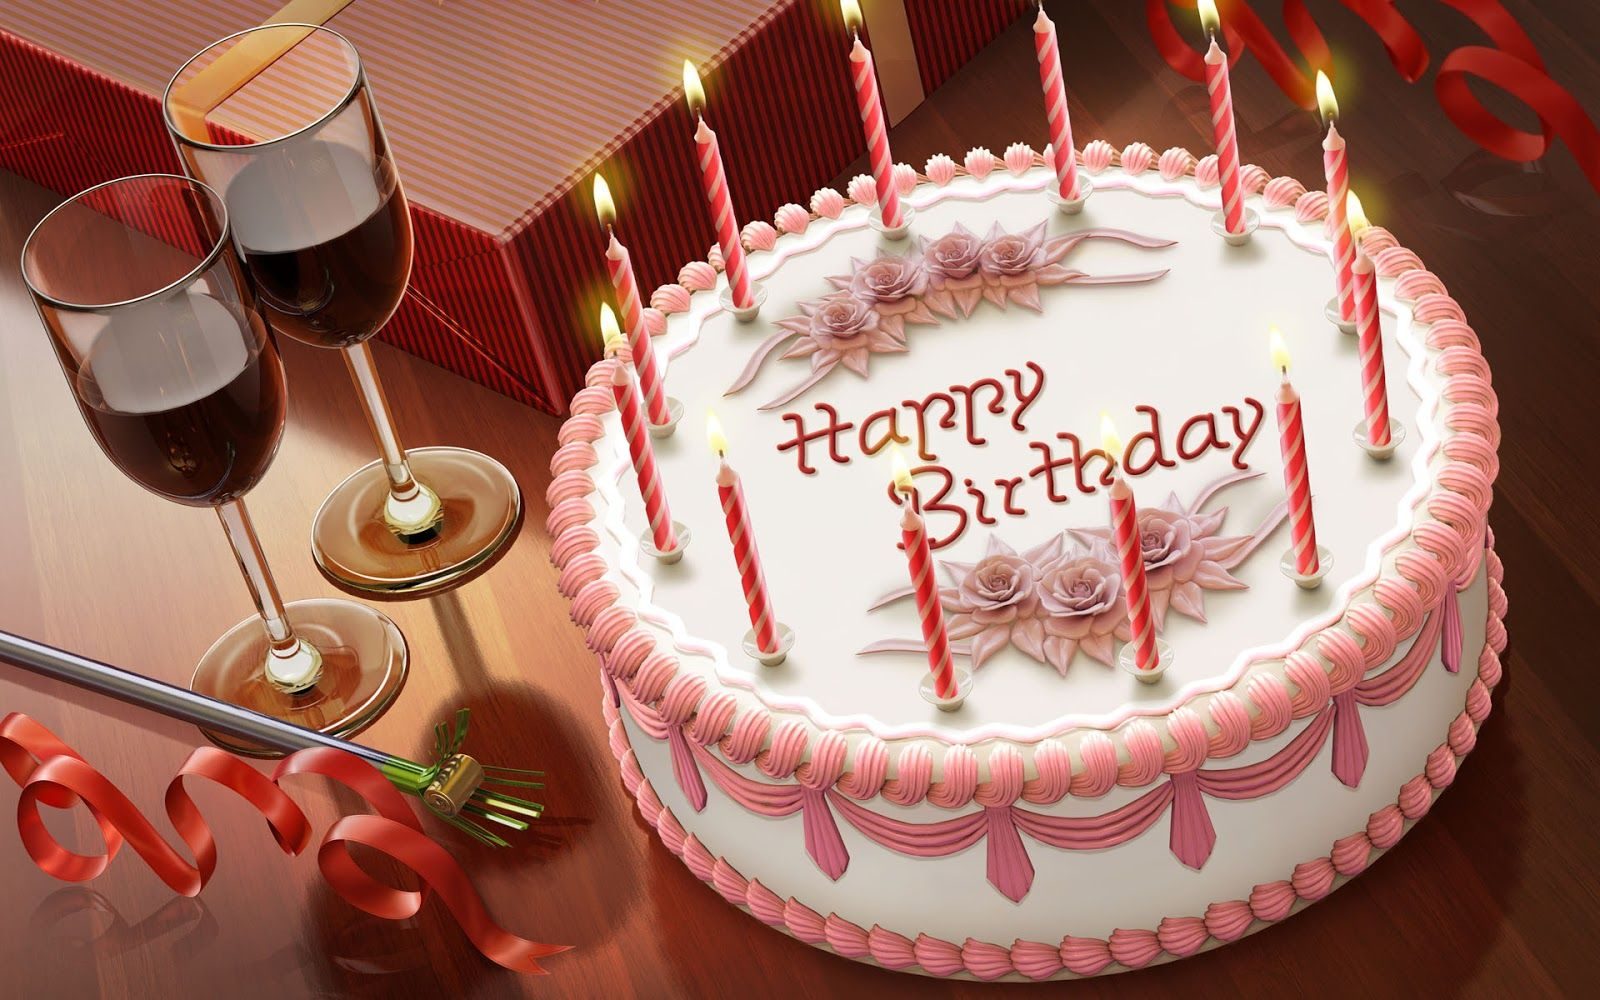 Birthdaylovequotes Happybirthdaysms Quotesoflife Happy Day